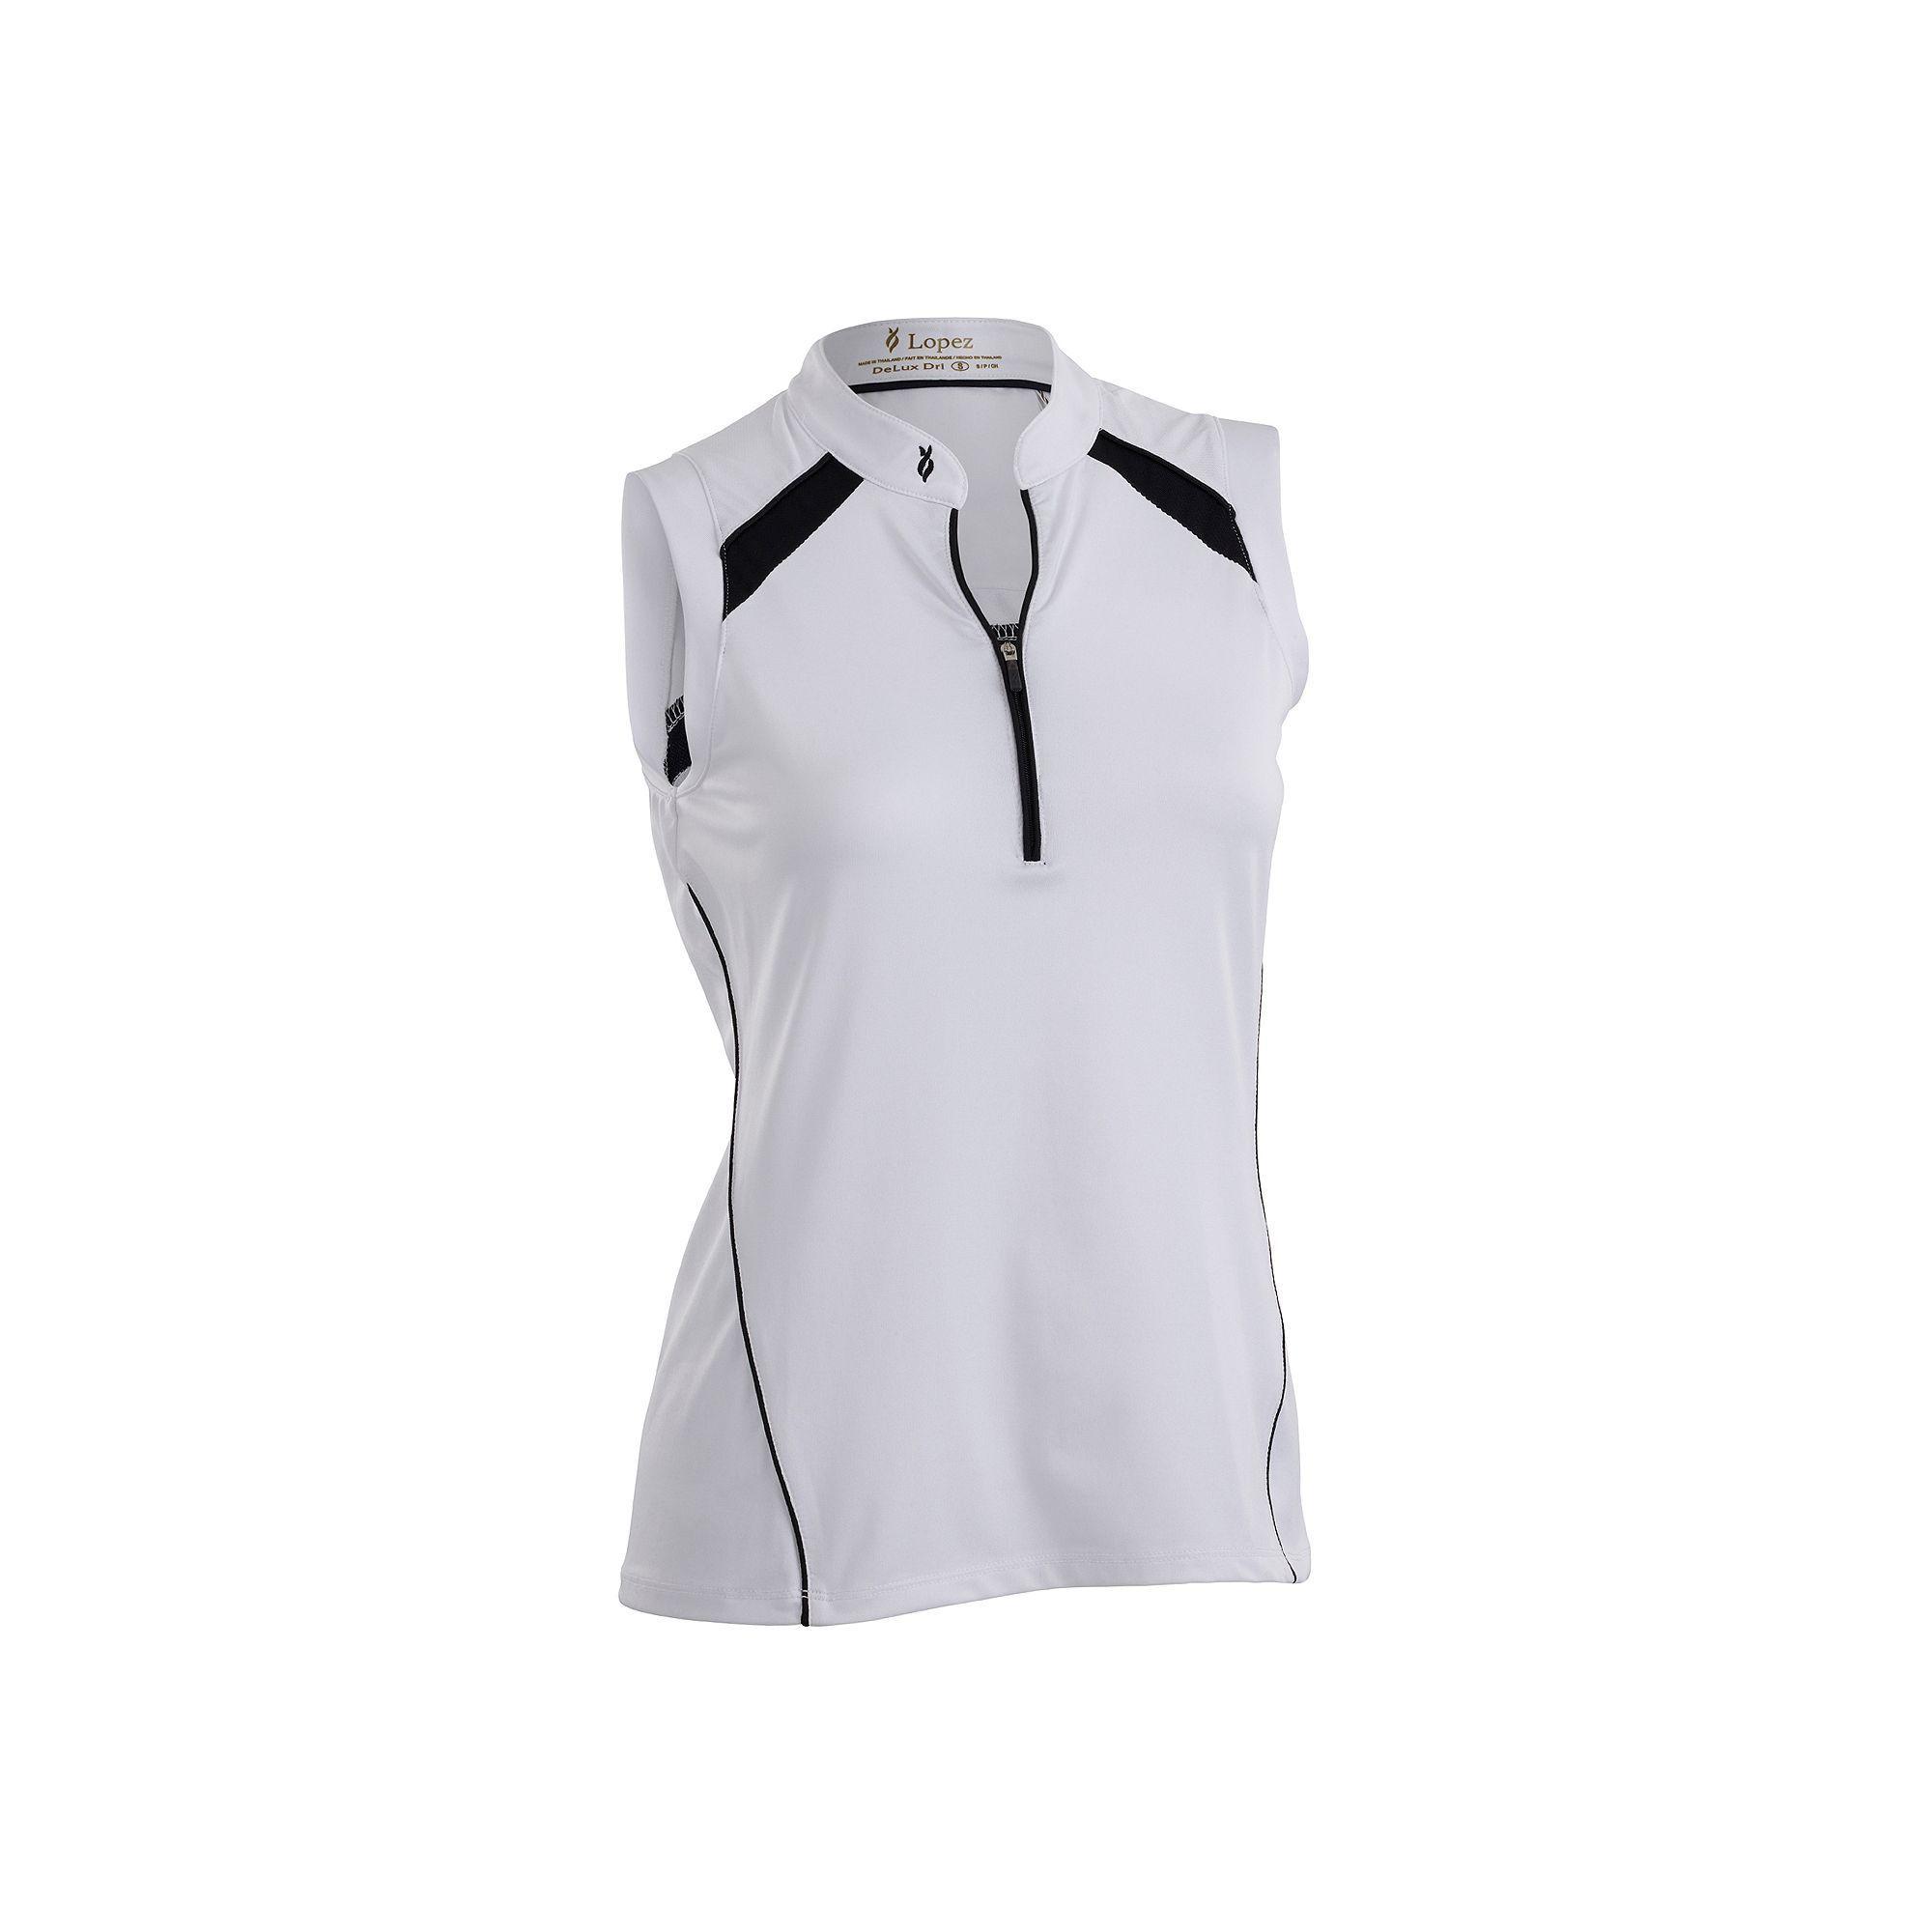 Plus Size Golf Polo Shirts Bcd Tofu House